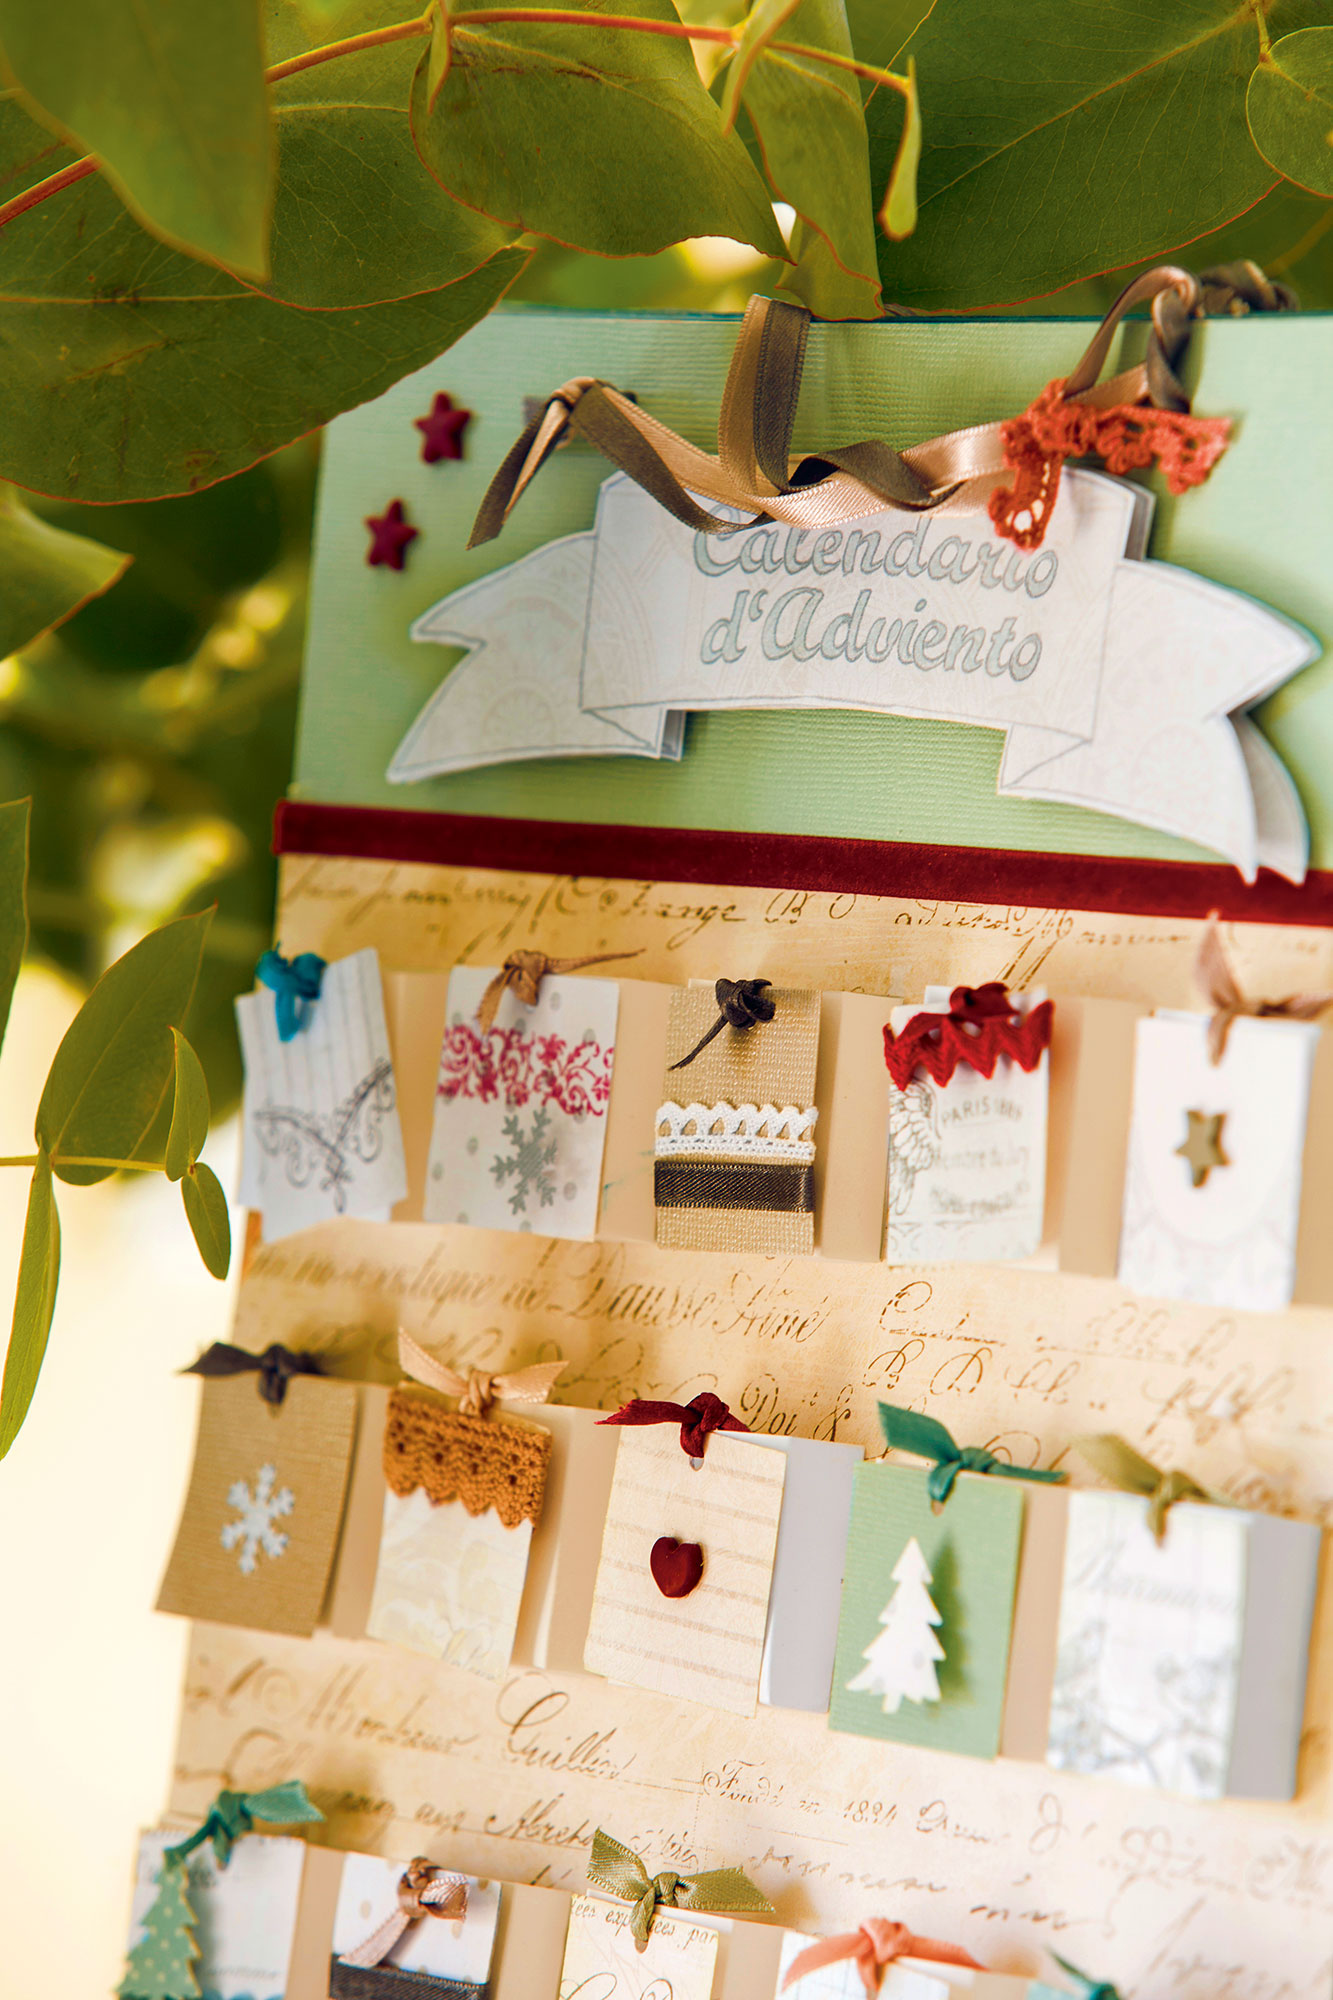 Advent calendar detail handmade. A handmade advent calendar